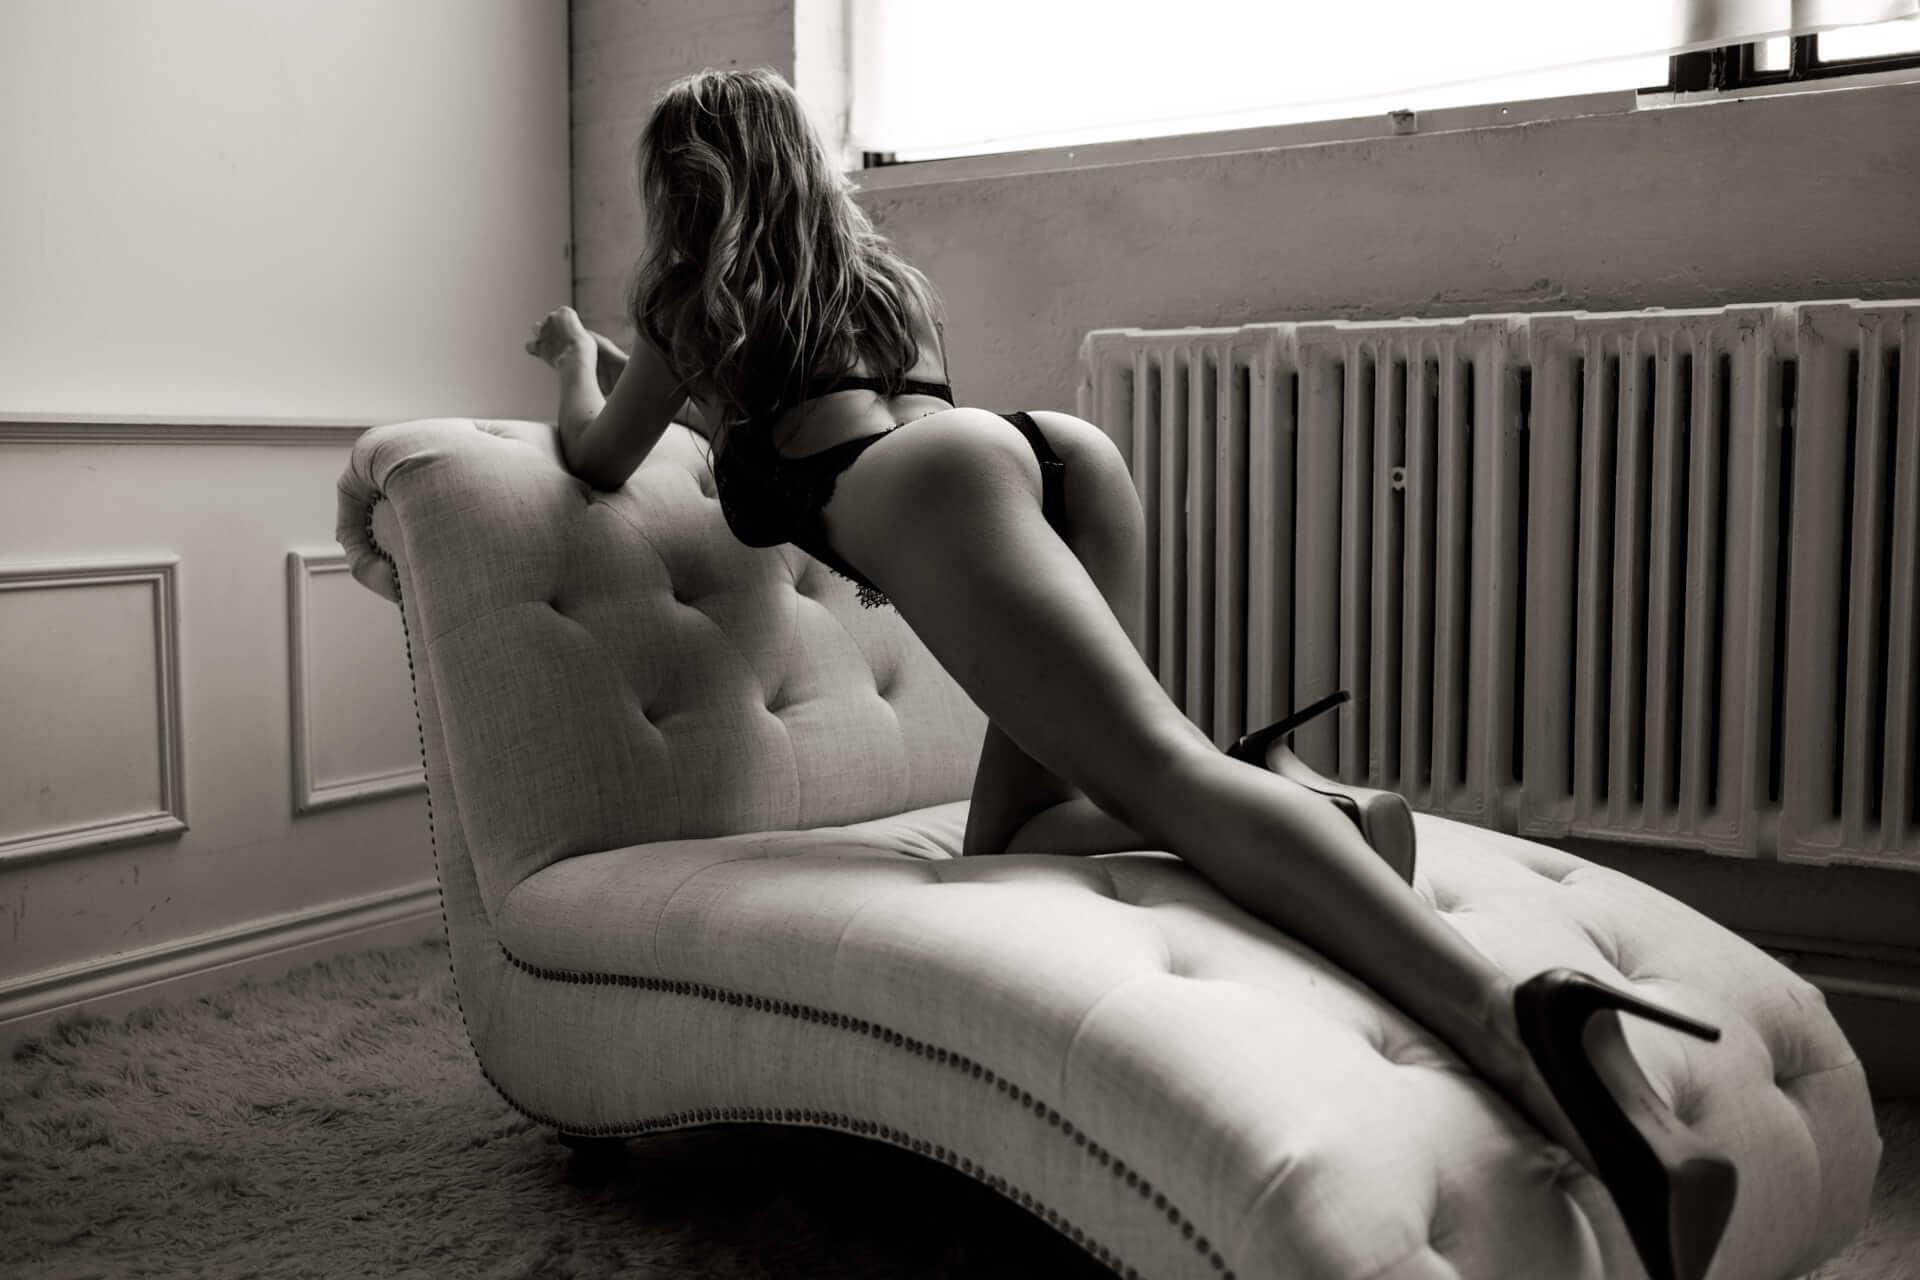 Toronto boudoir photographer professional photography studio sexy photography sensual images